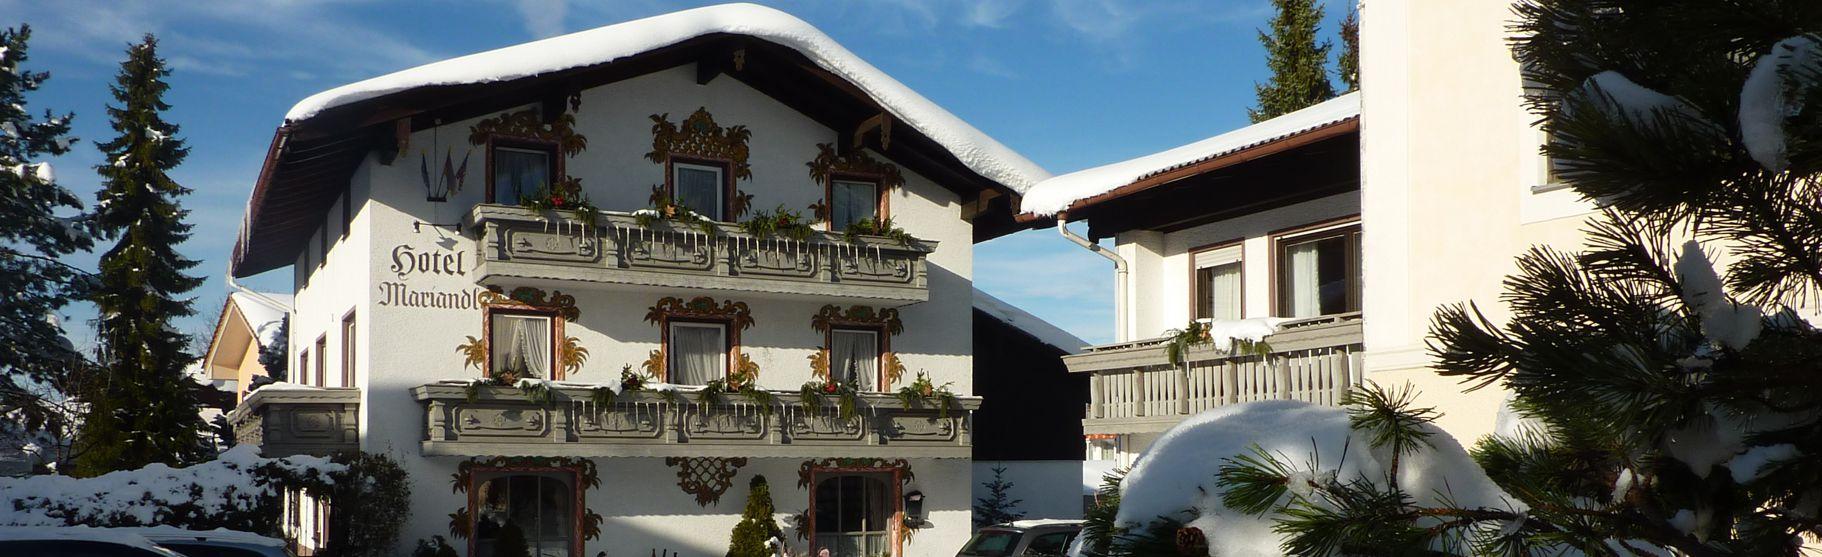 hotel-winter.jpg